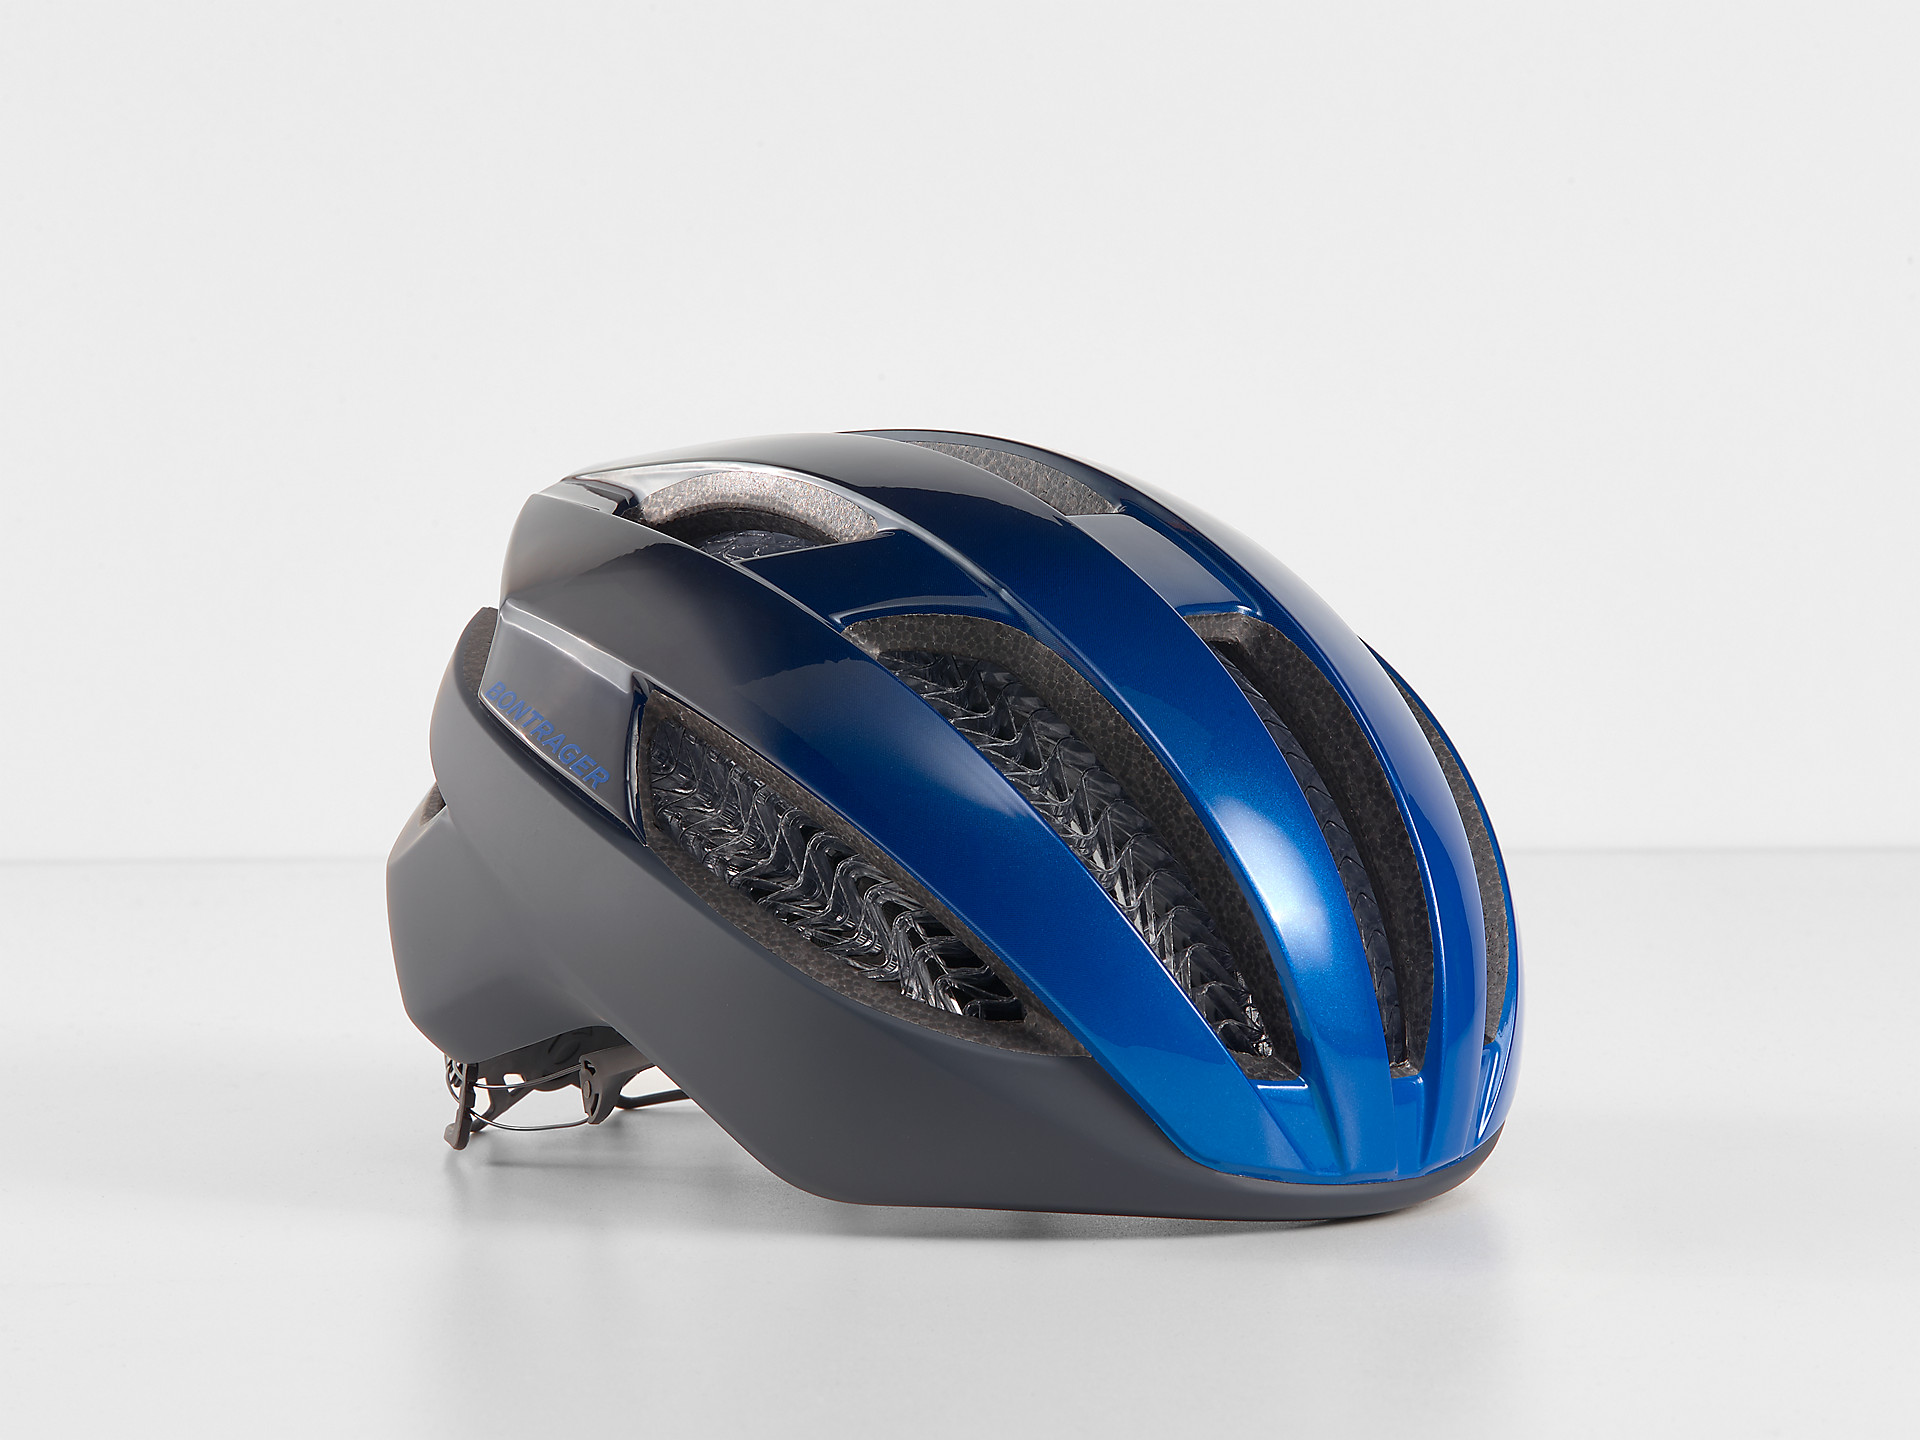 www.bicycleretailer.com